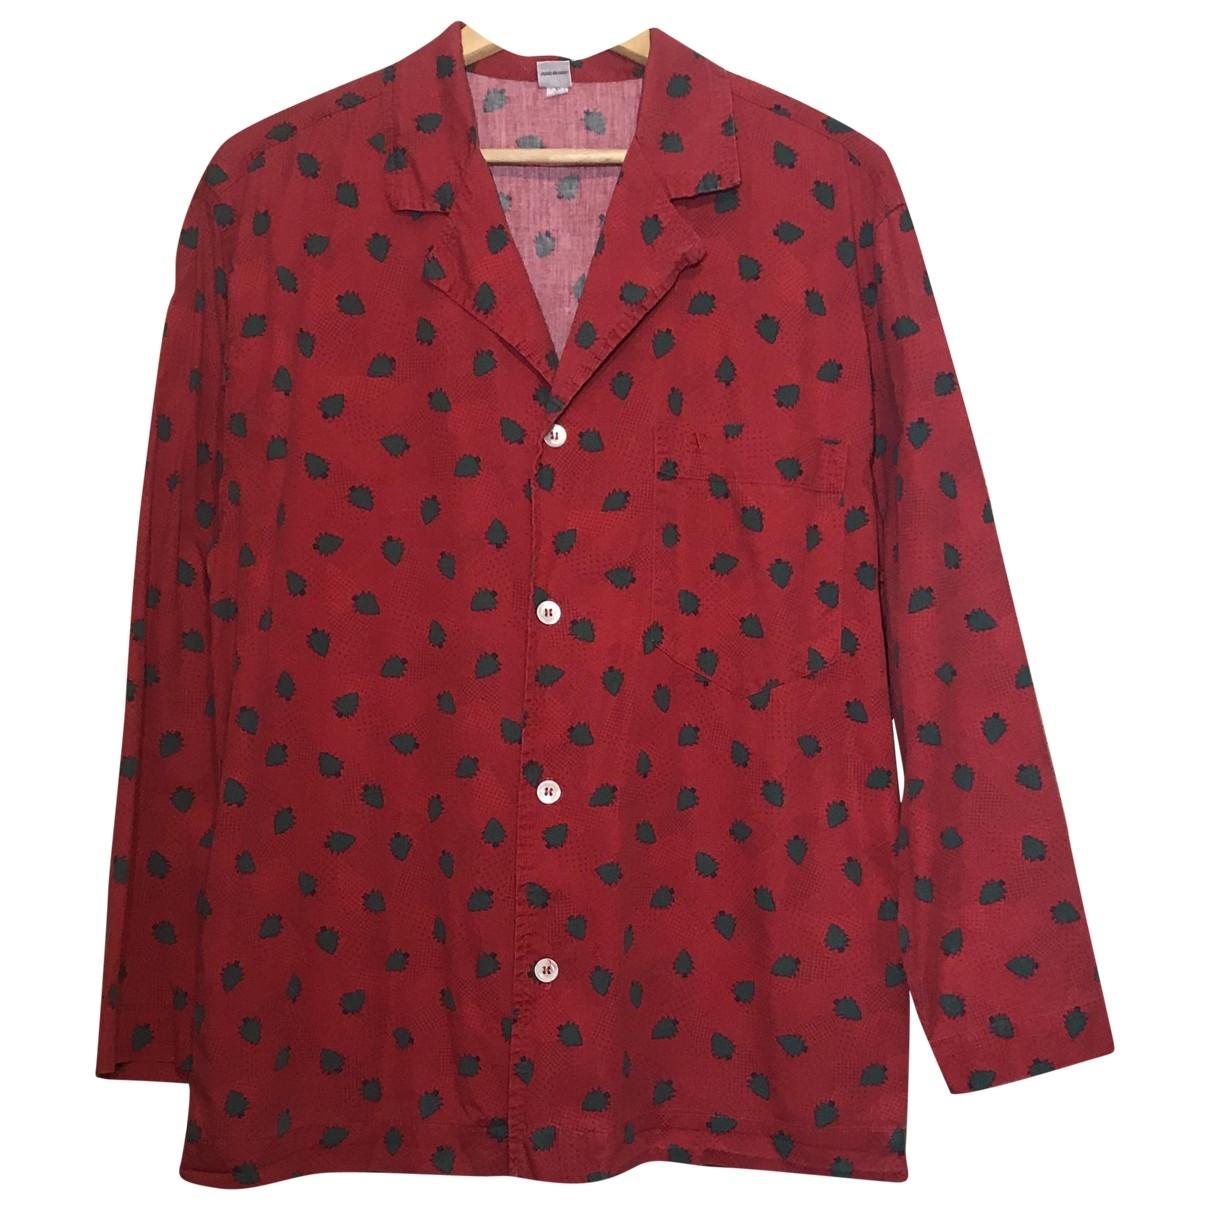 Valentino Garavani \N Red Cotton Shirts for Men M International